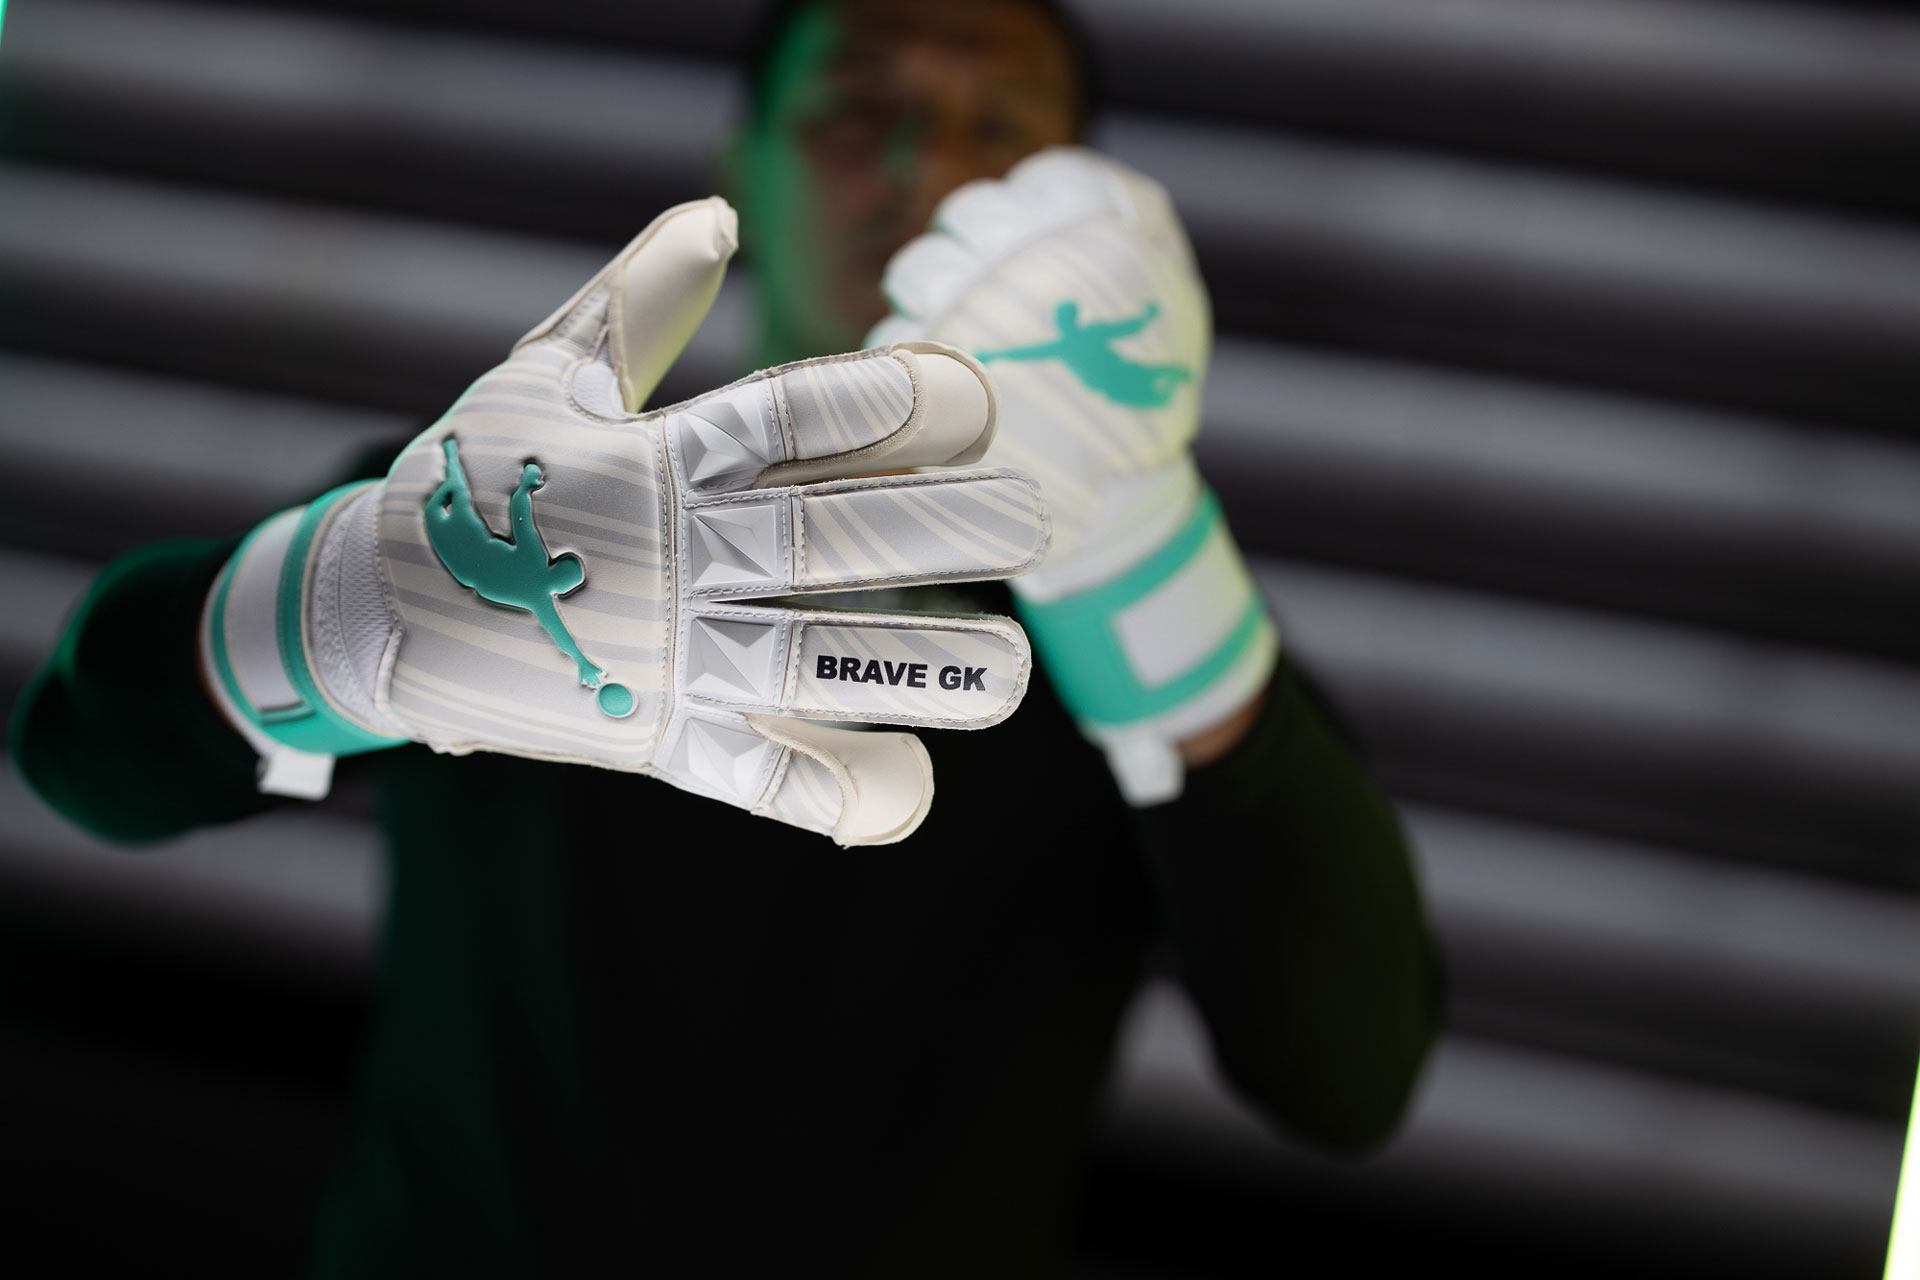 Воротарські рукавиці Brave GK Rescuer Turquoise - офіційний інтернет-магазин Brave GK